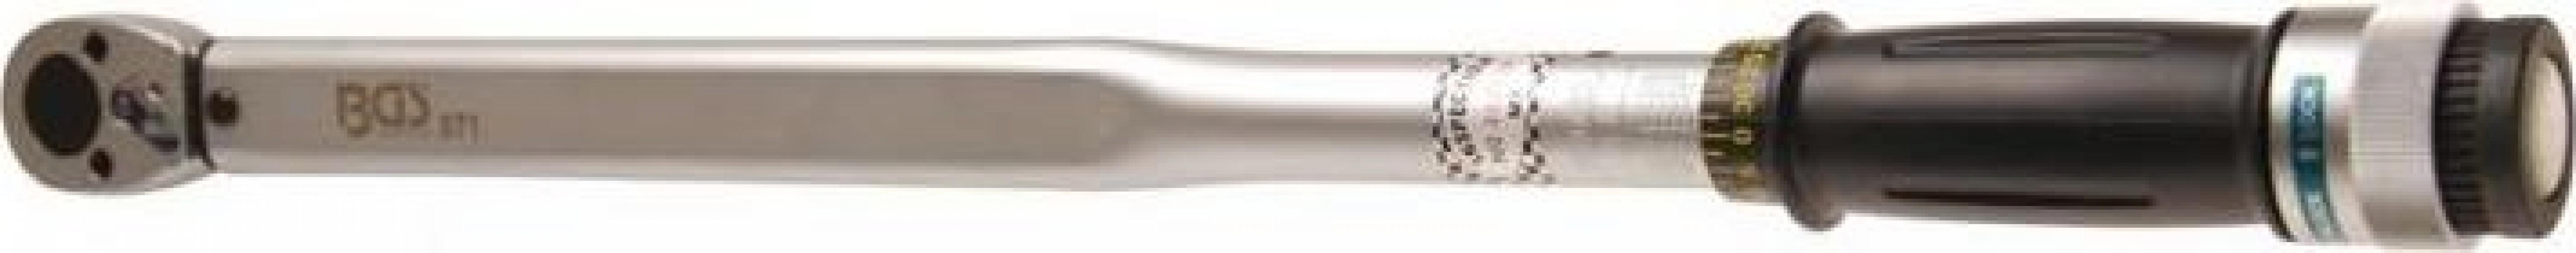 Cheie dinamometrica, 70-350Nm, act. 1/2'' BGS971